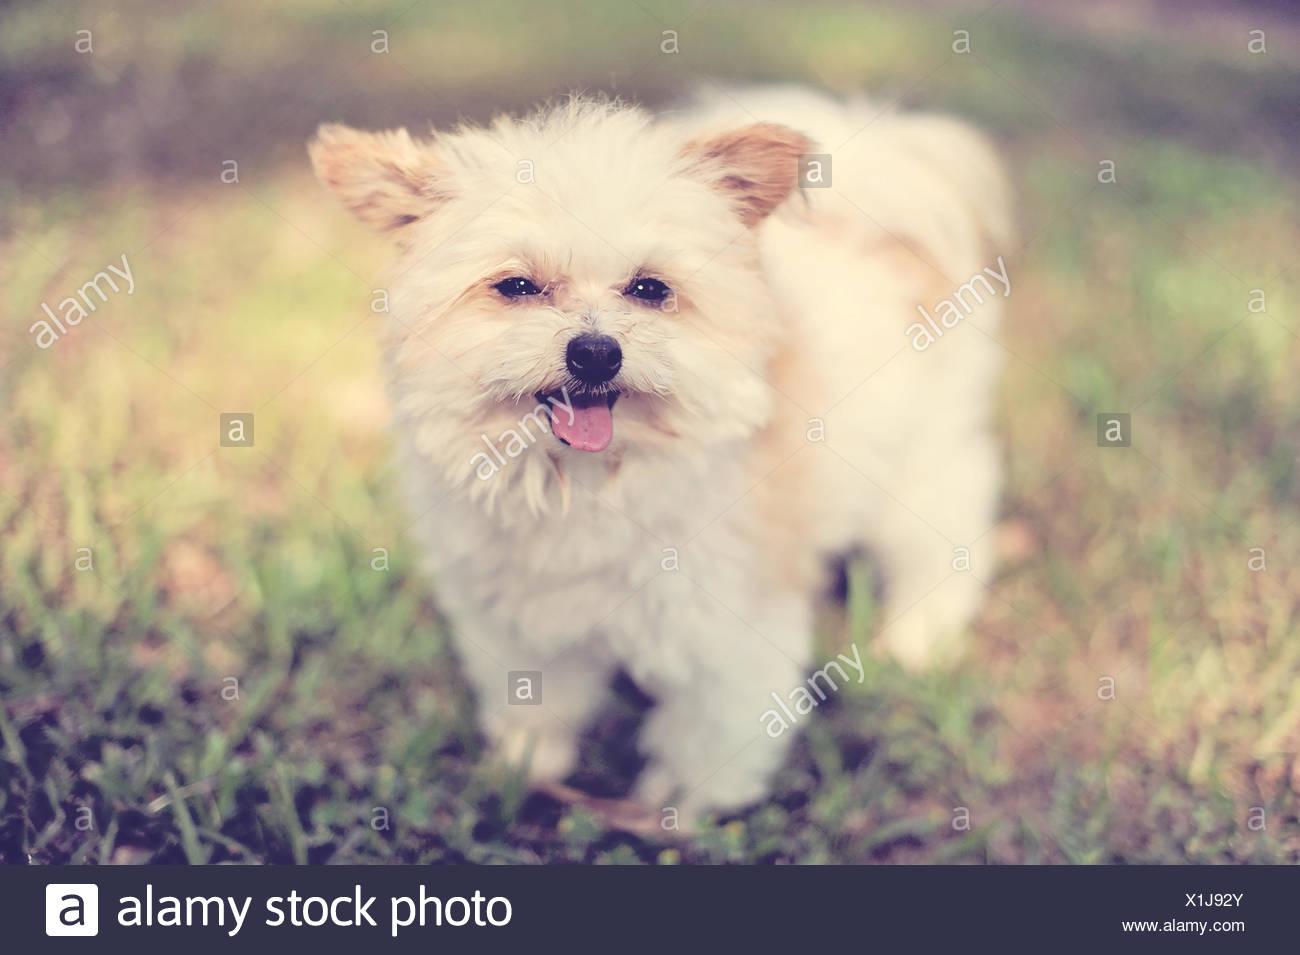 Fluffy dog in backyard - Stock Image